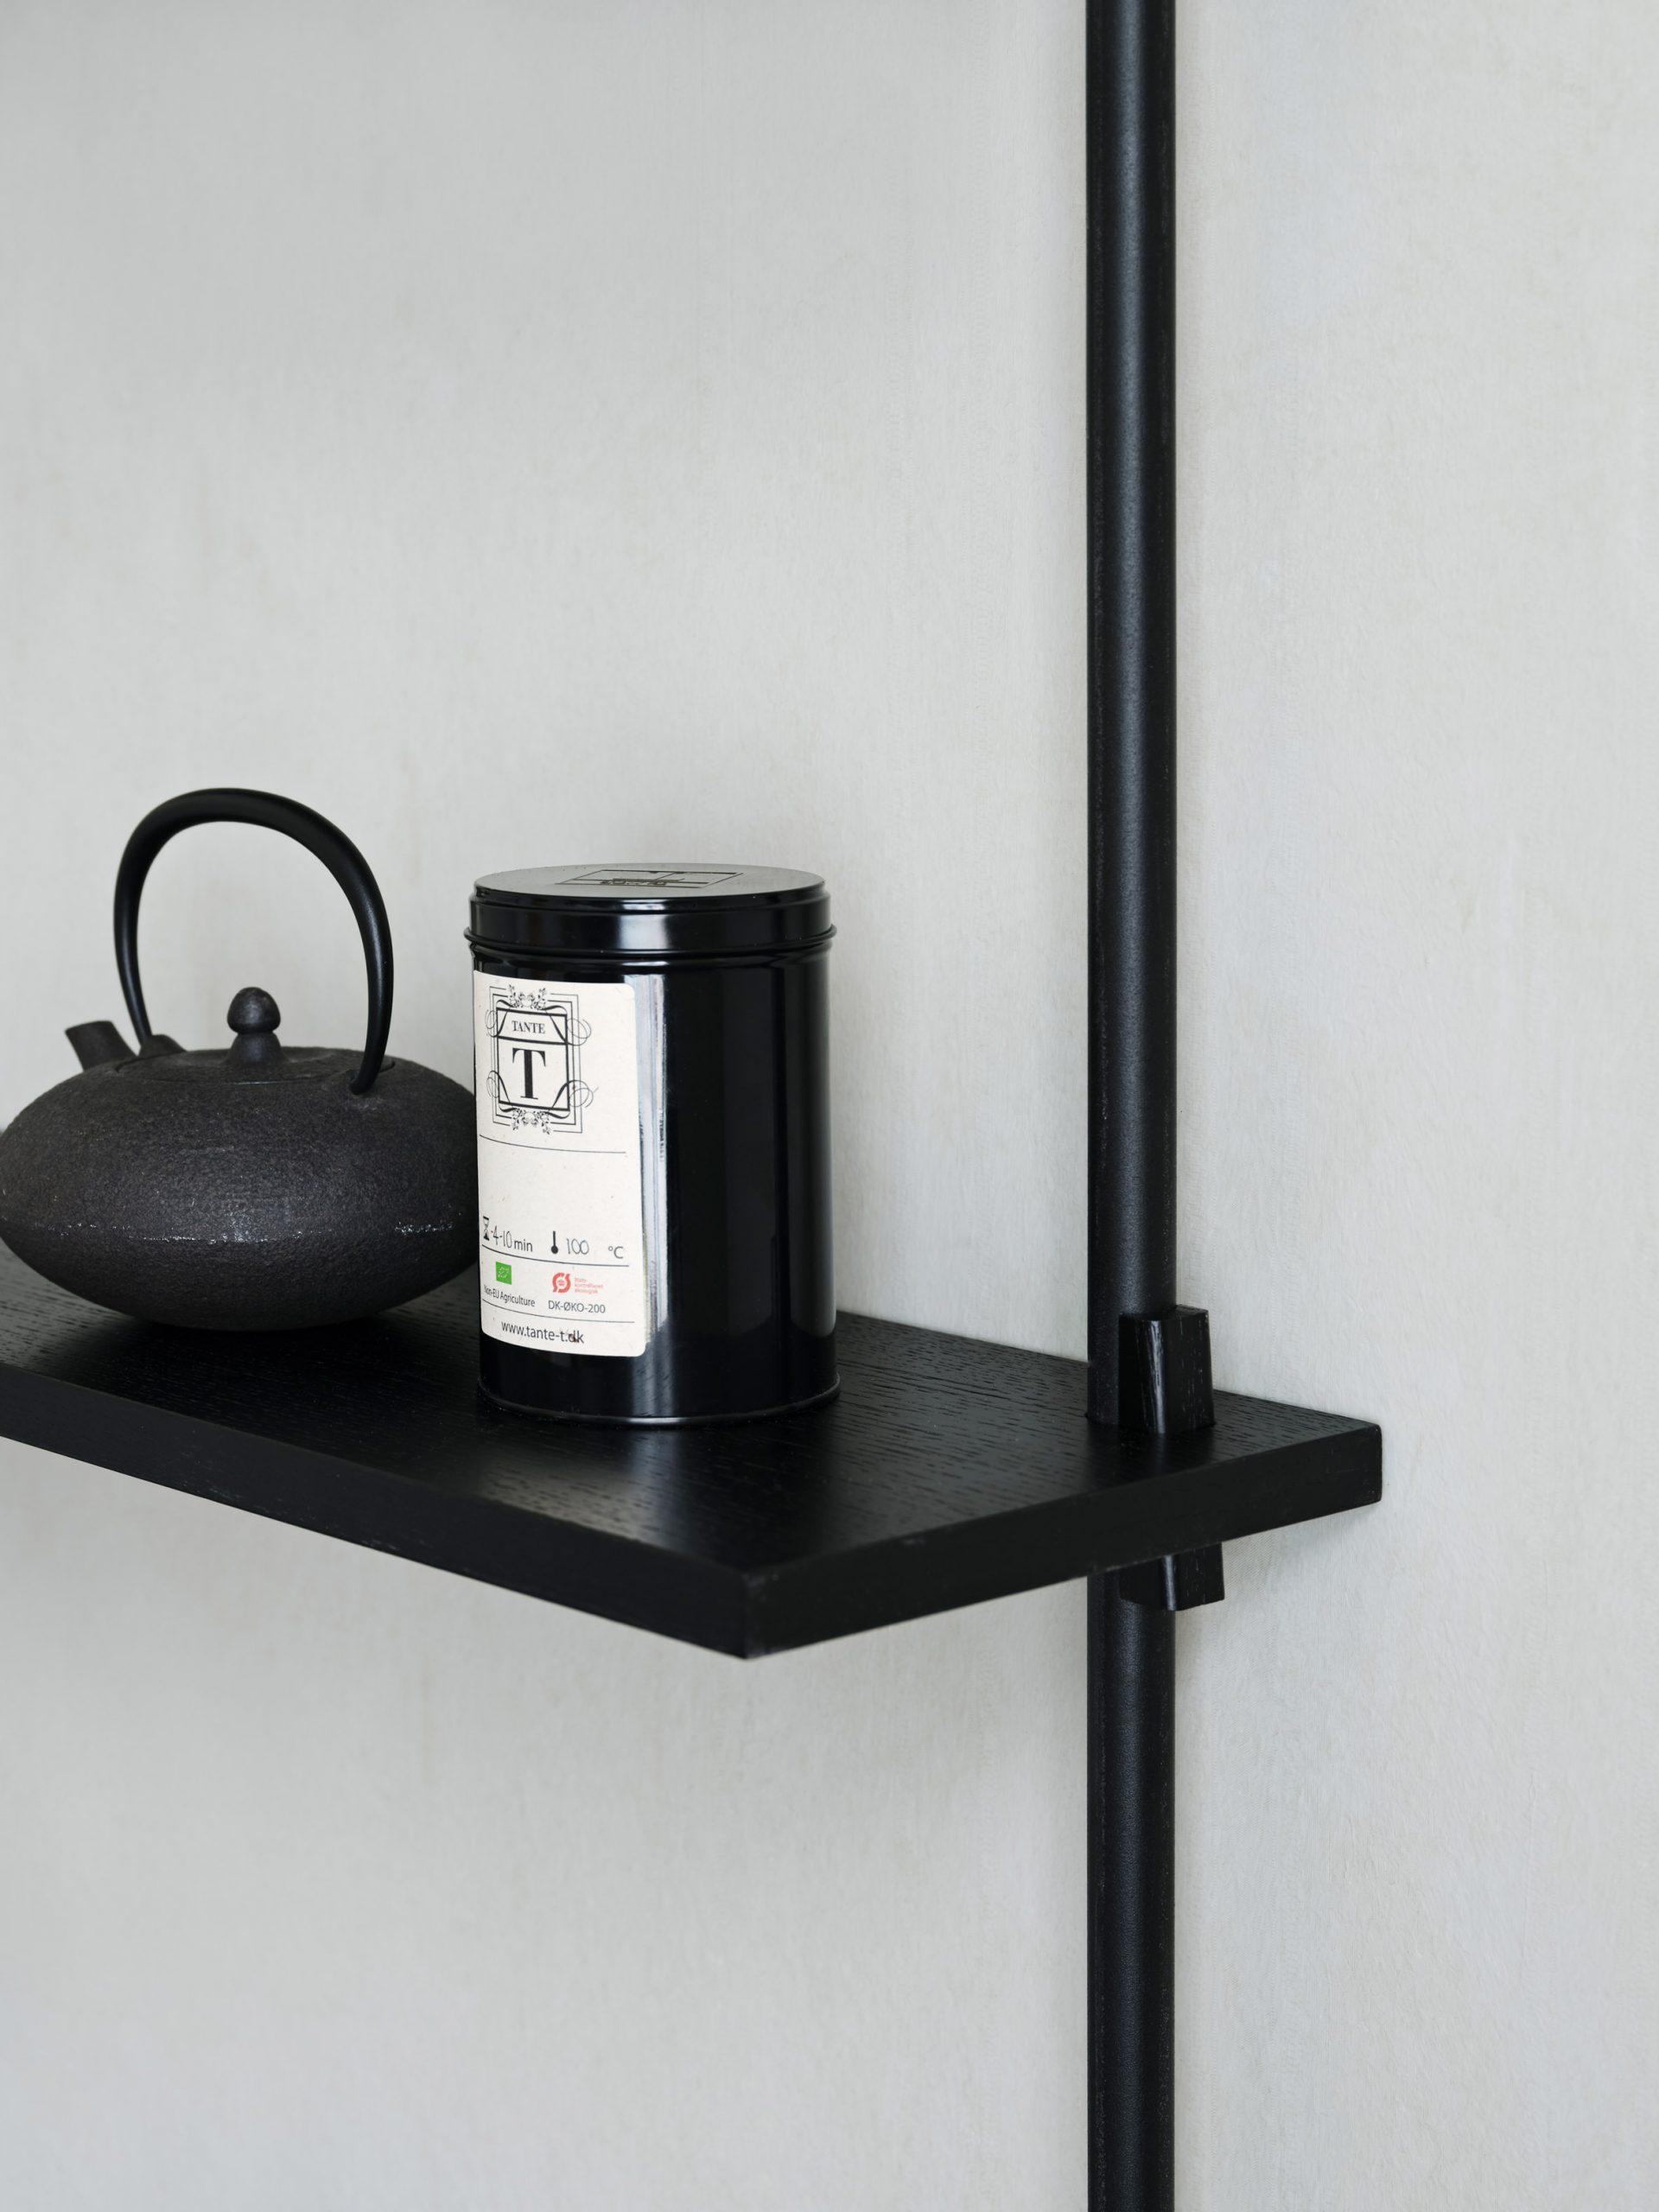 A black shelf